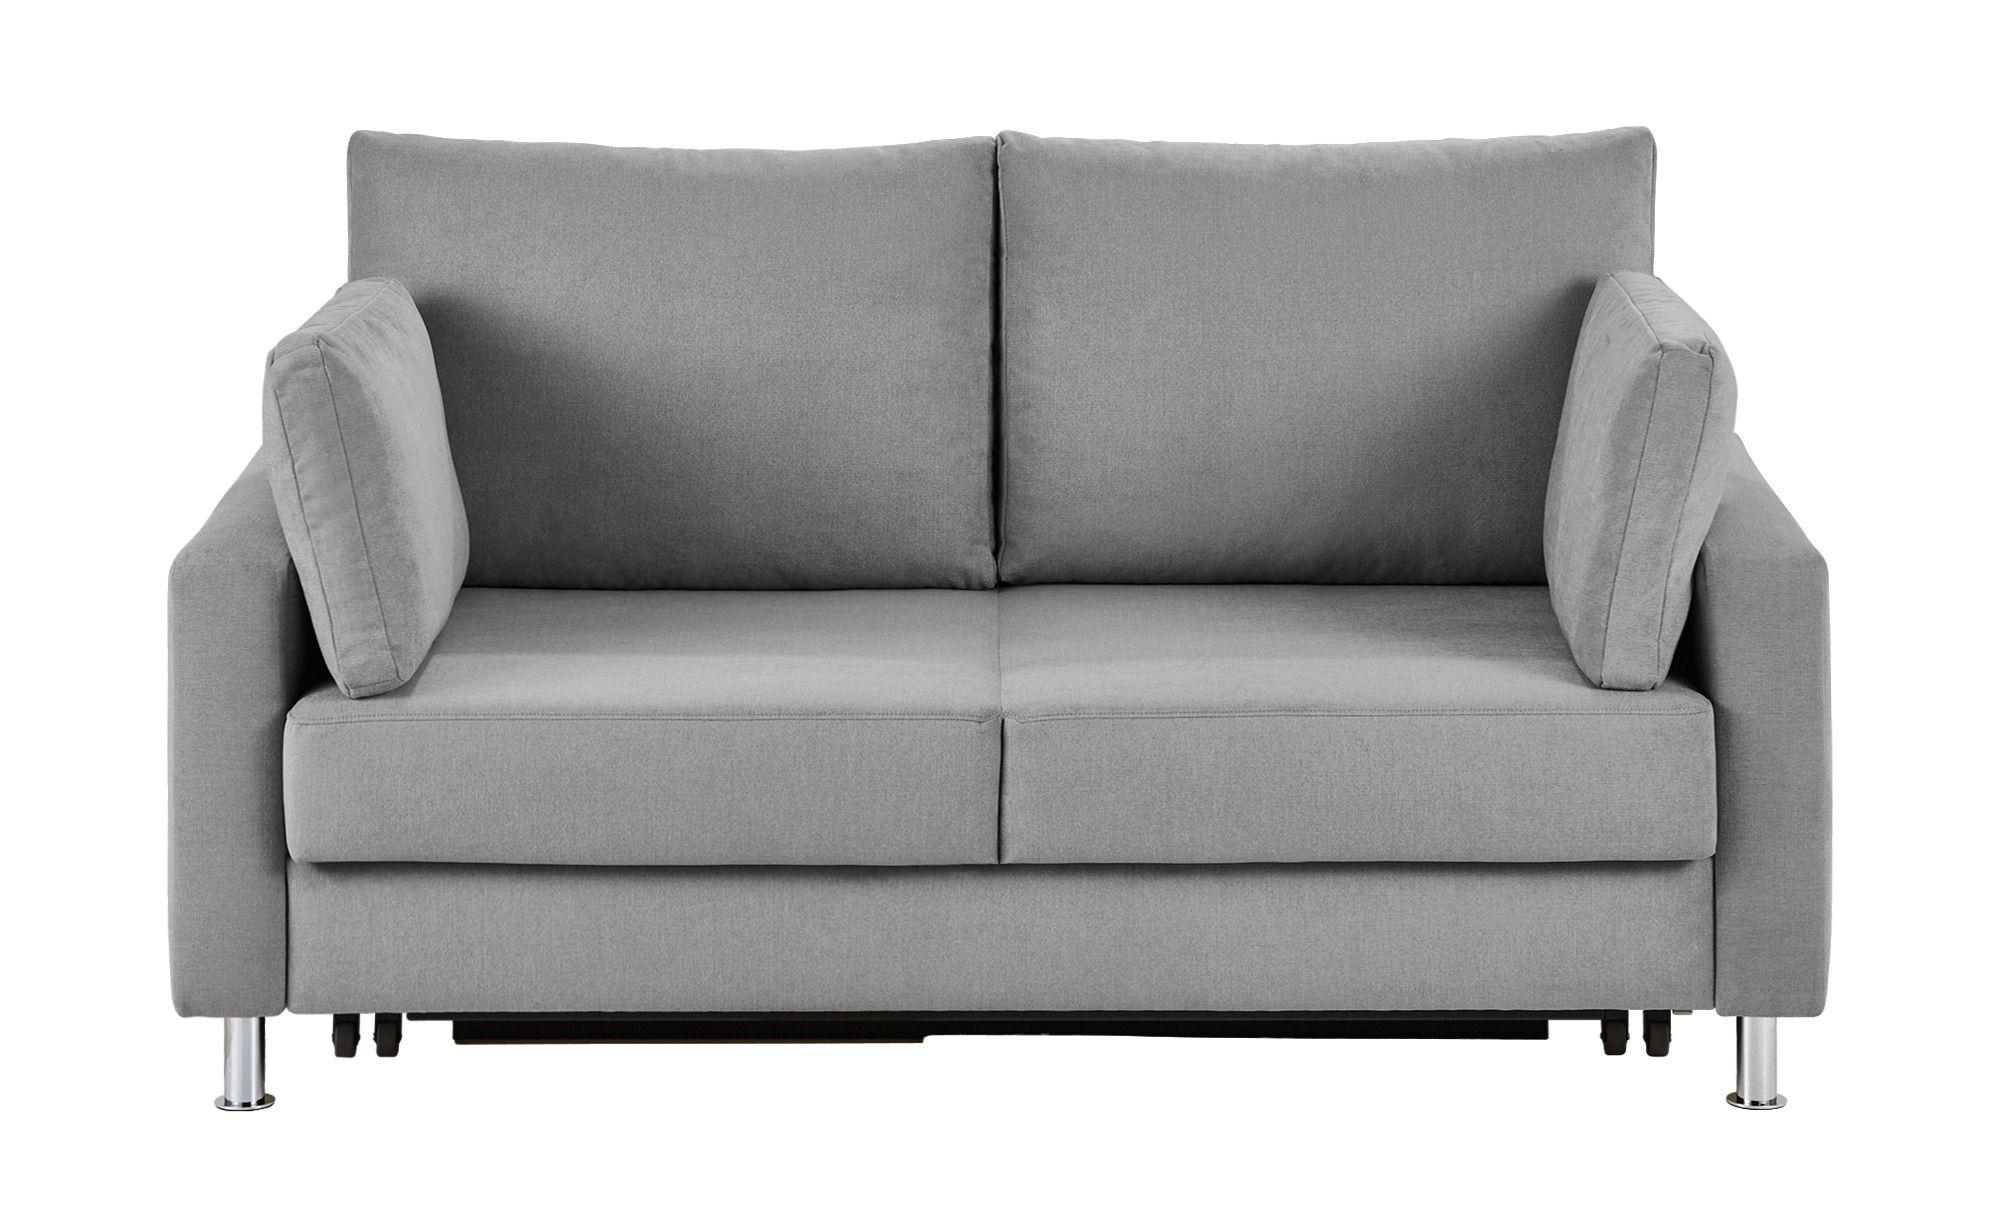 Genial Schlafsofa 1 60 M Breit Deutsche In 2019 Sofa Sofa